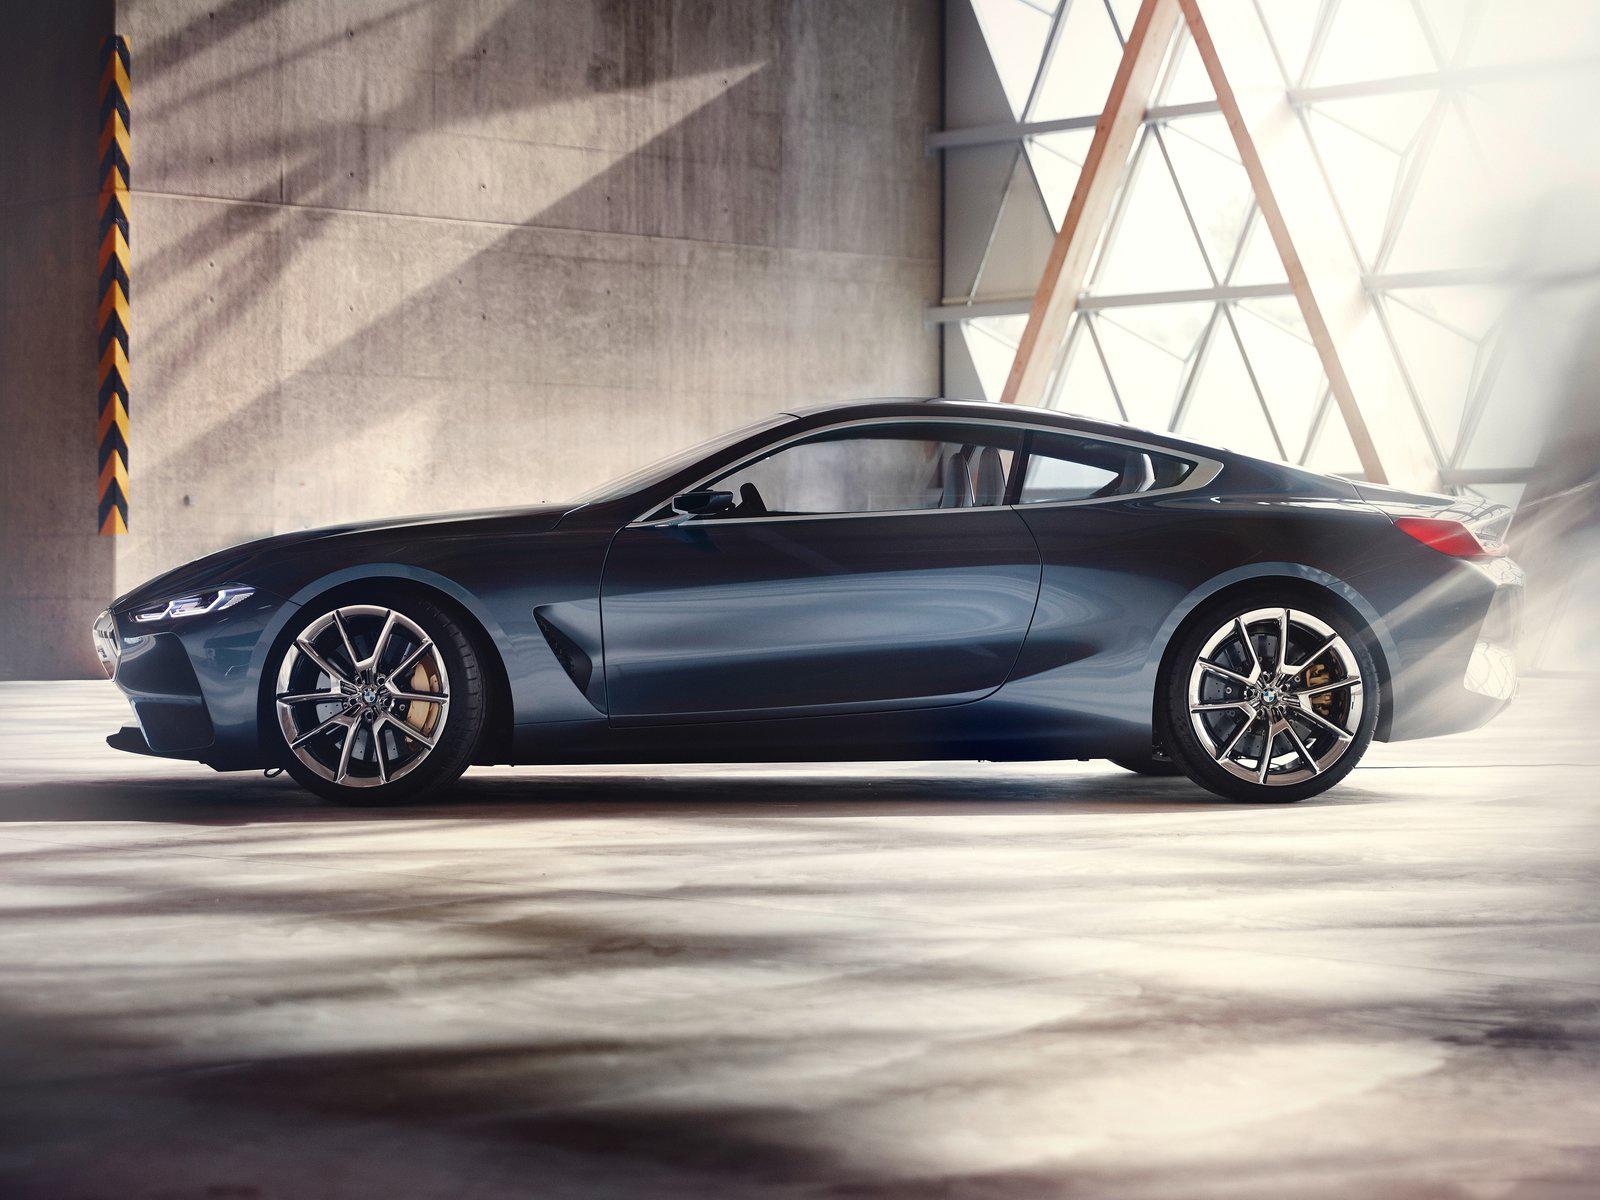 BMW-8-Series_Concept-2017-1600-09.jpg